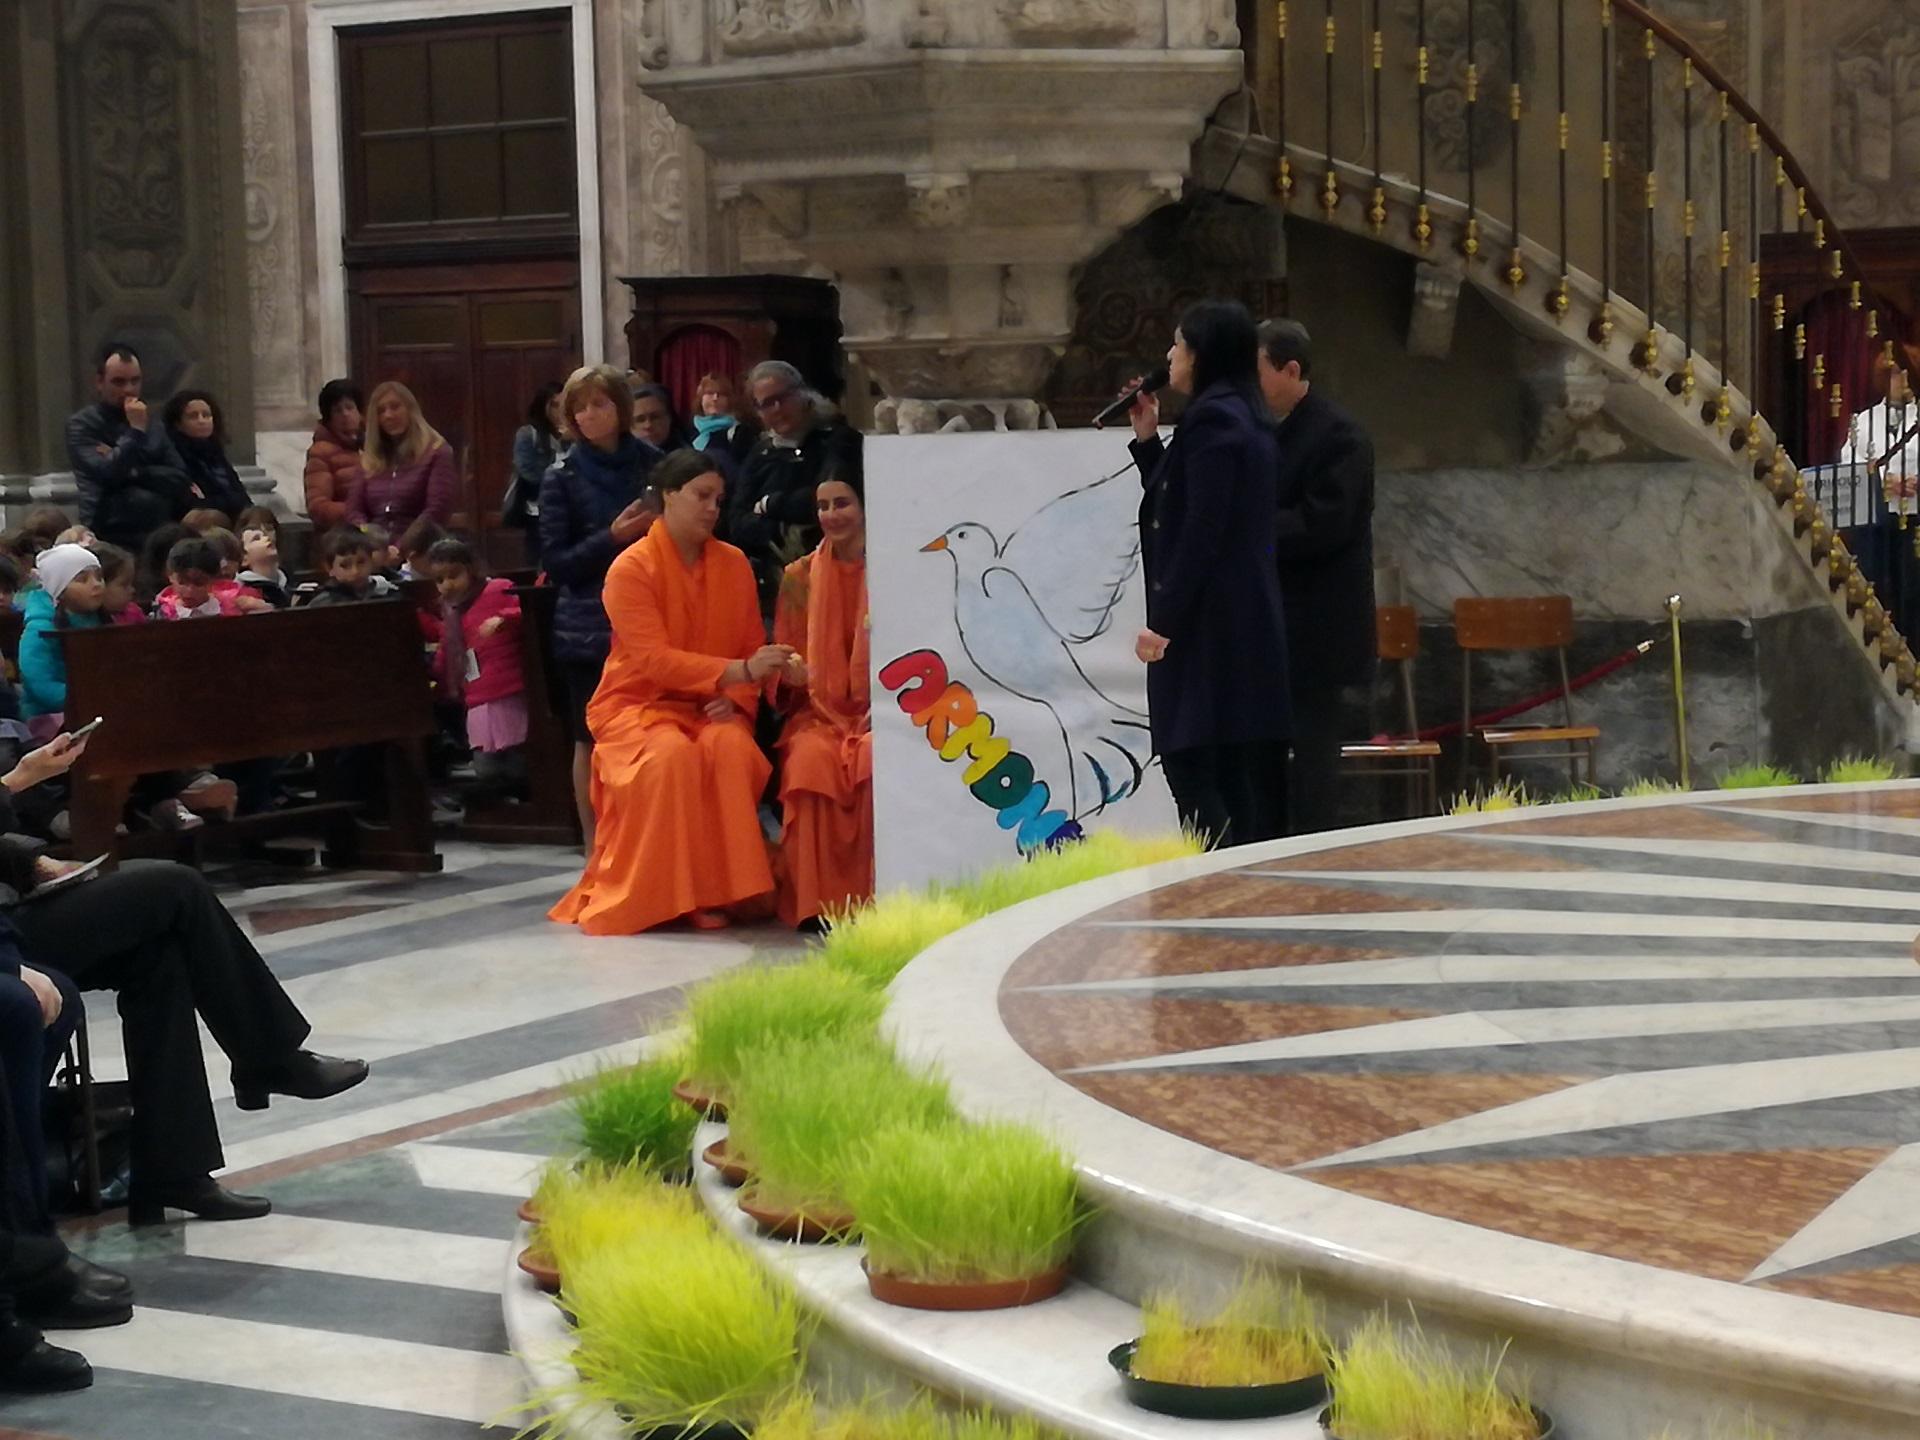 Settimana di Pasqua Residenza Protetta Bagnasco - Opere Sociali Servizi Savona